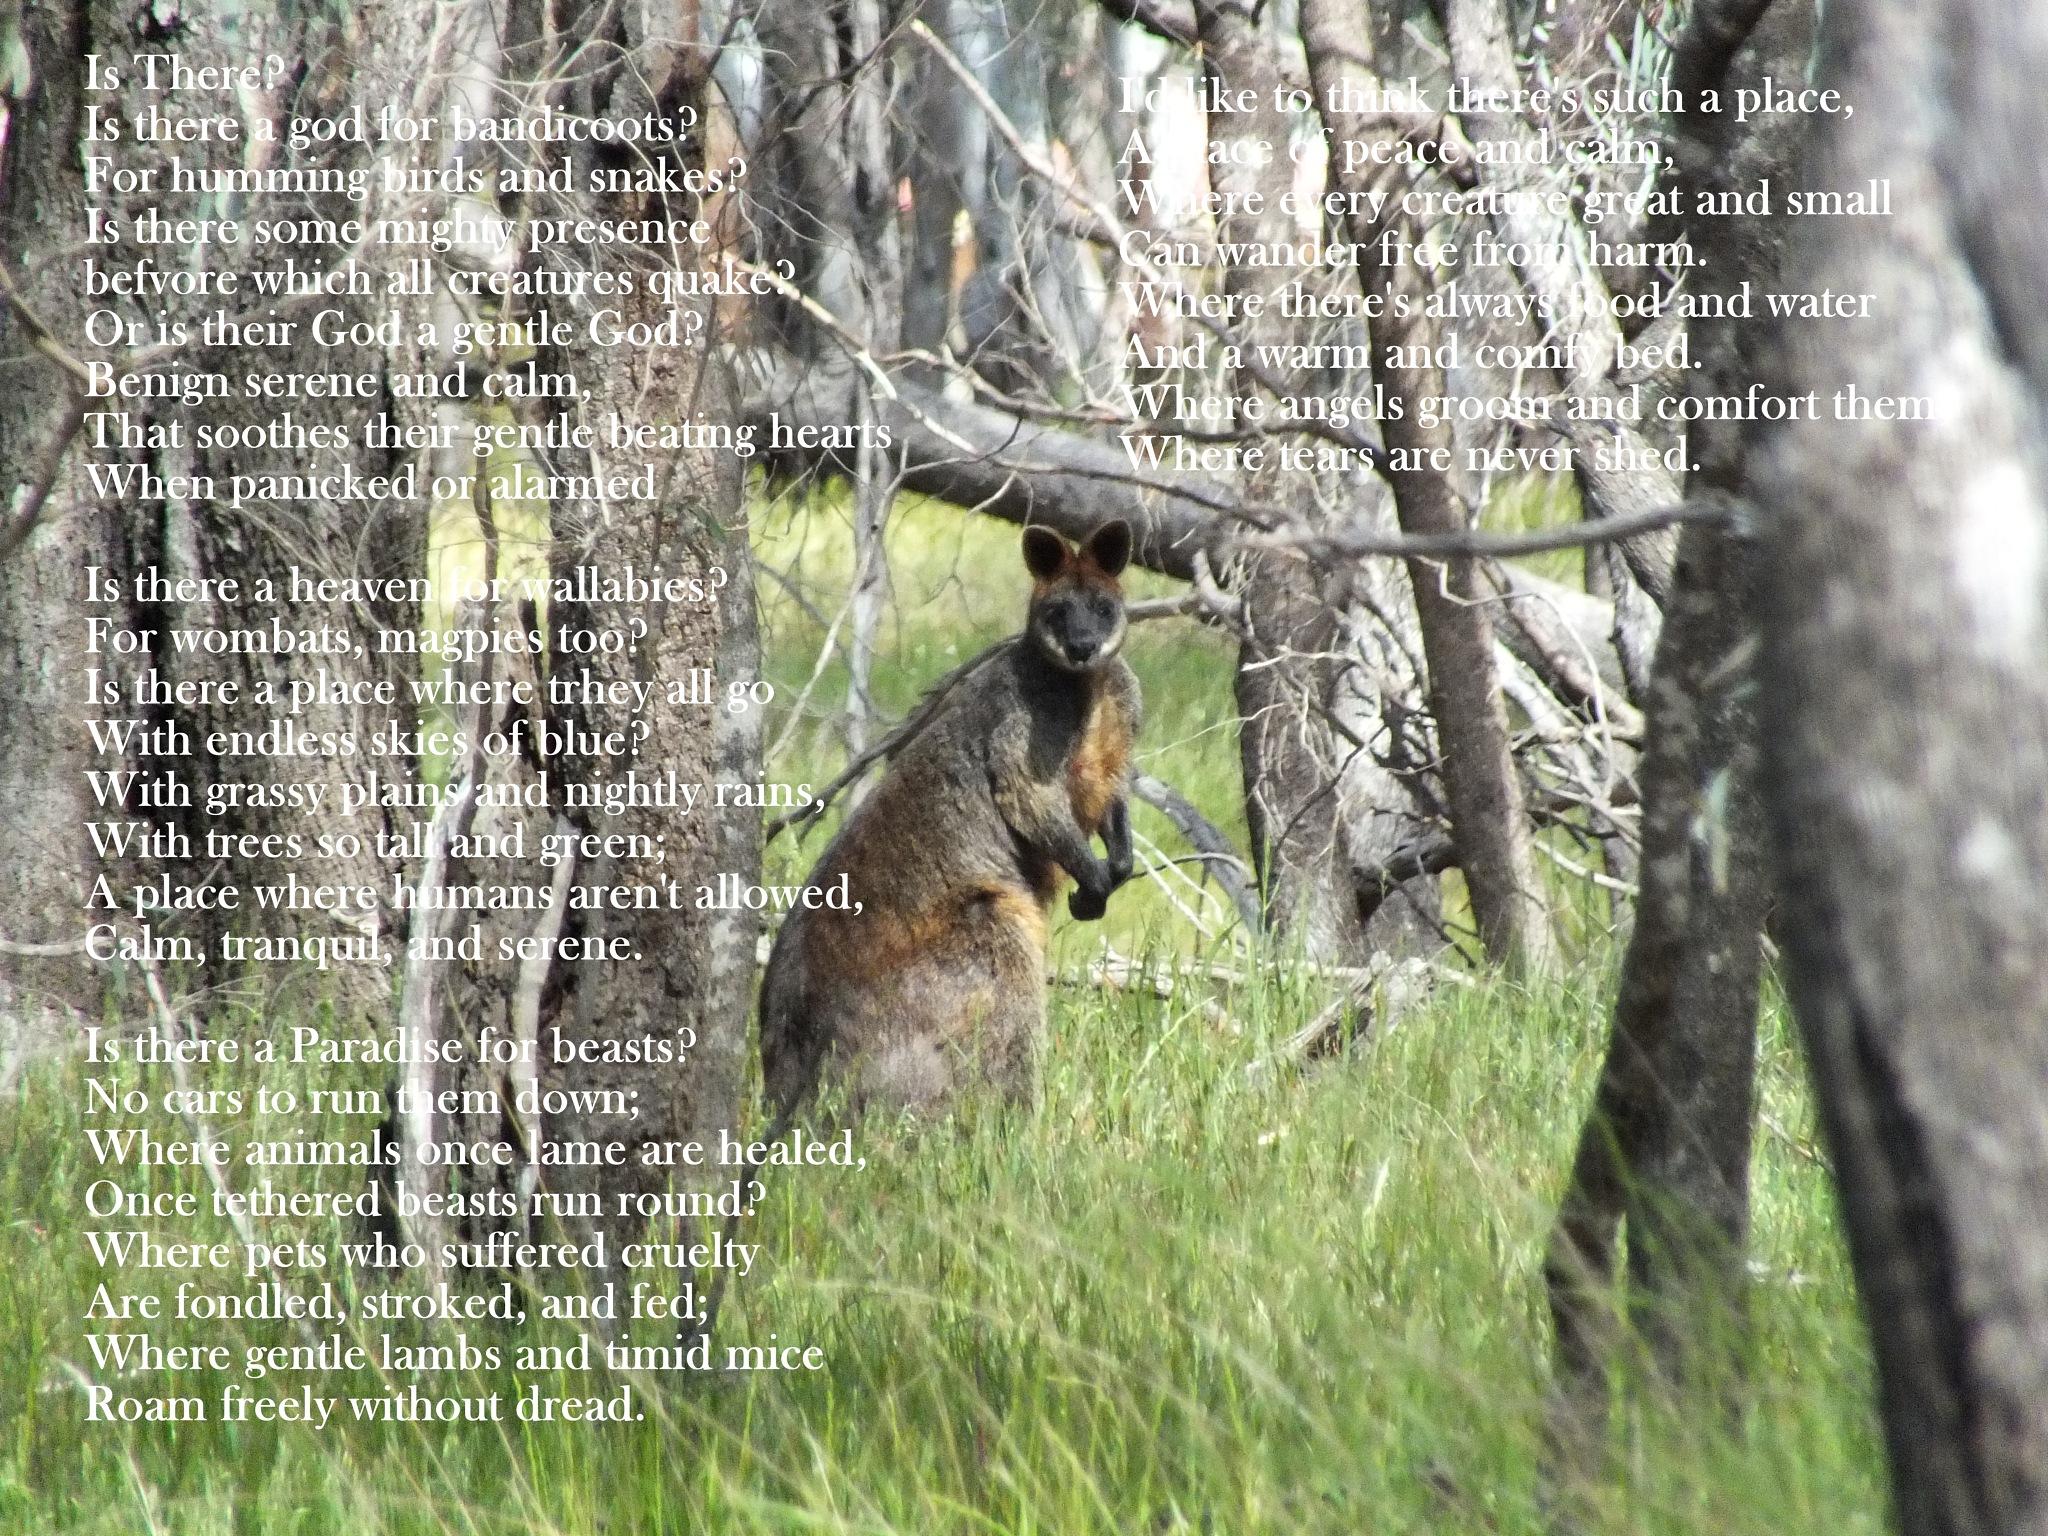 Swamp Wallaby by Paul Bownas